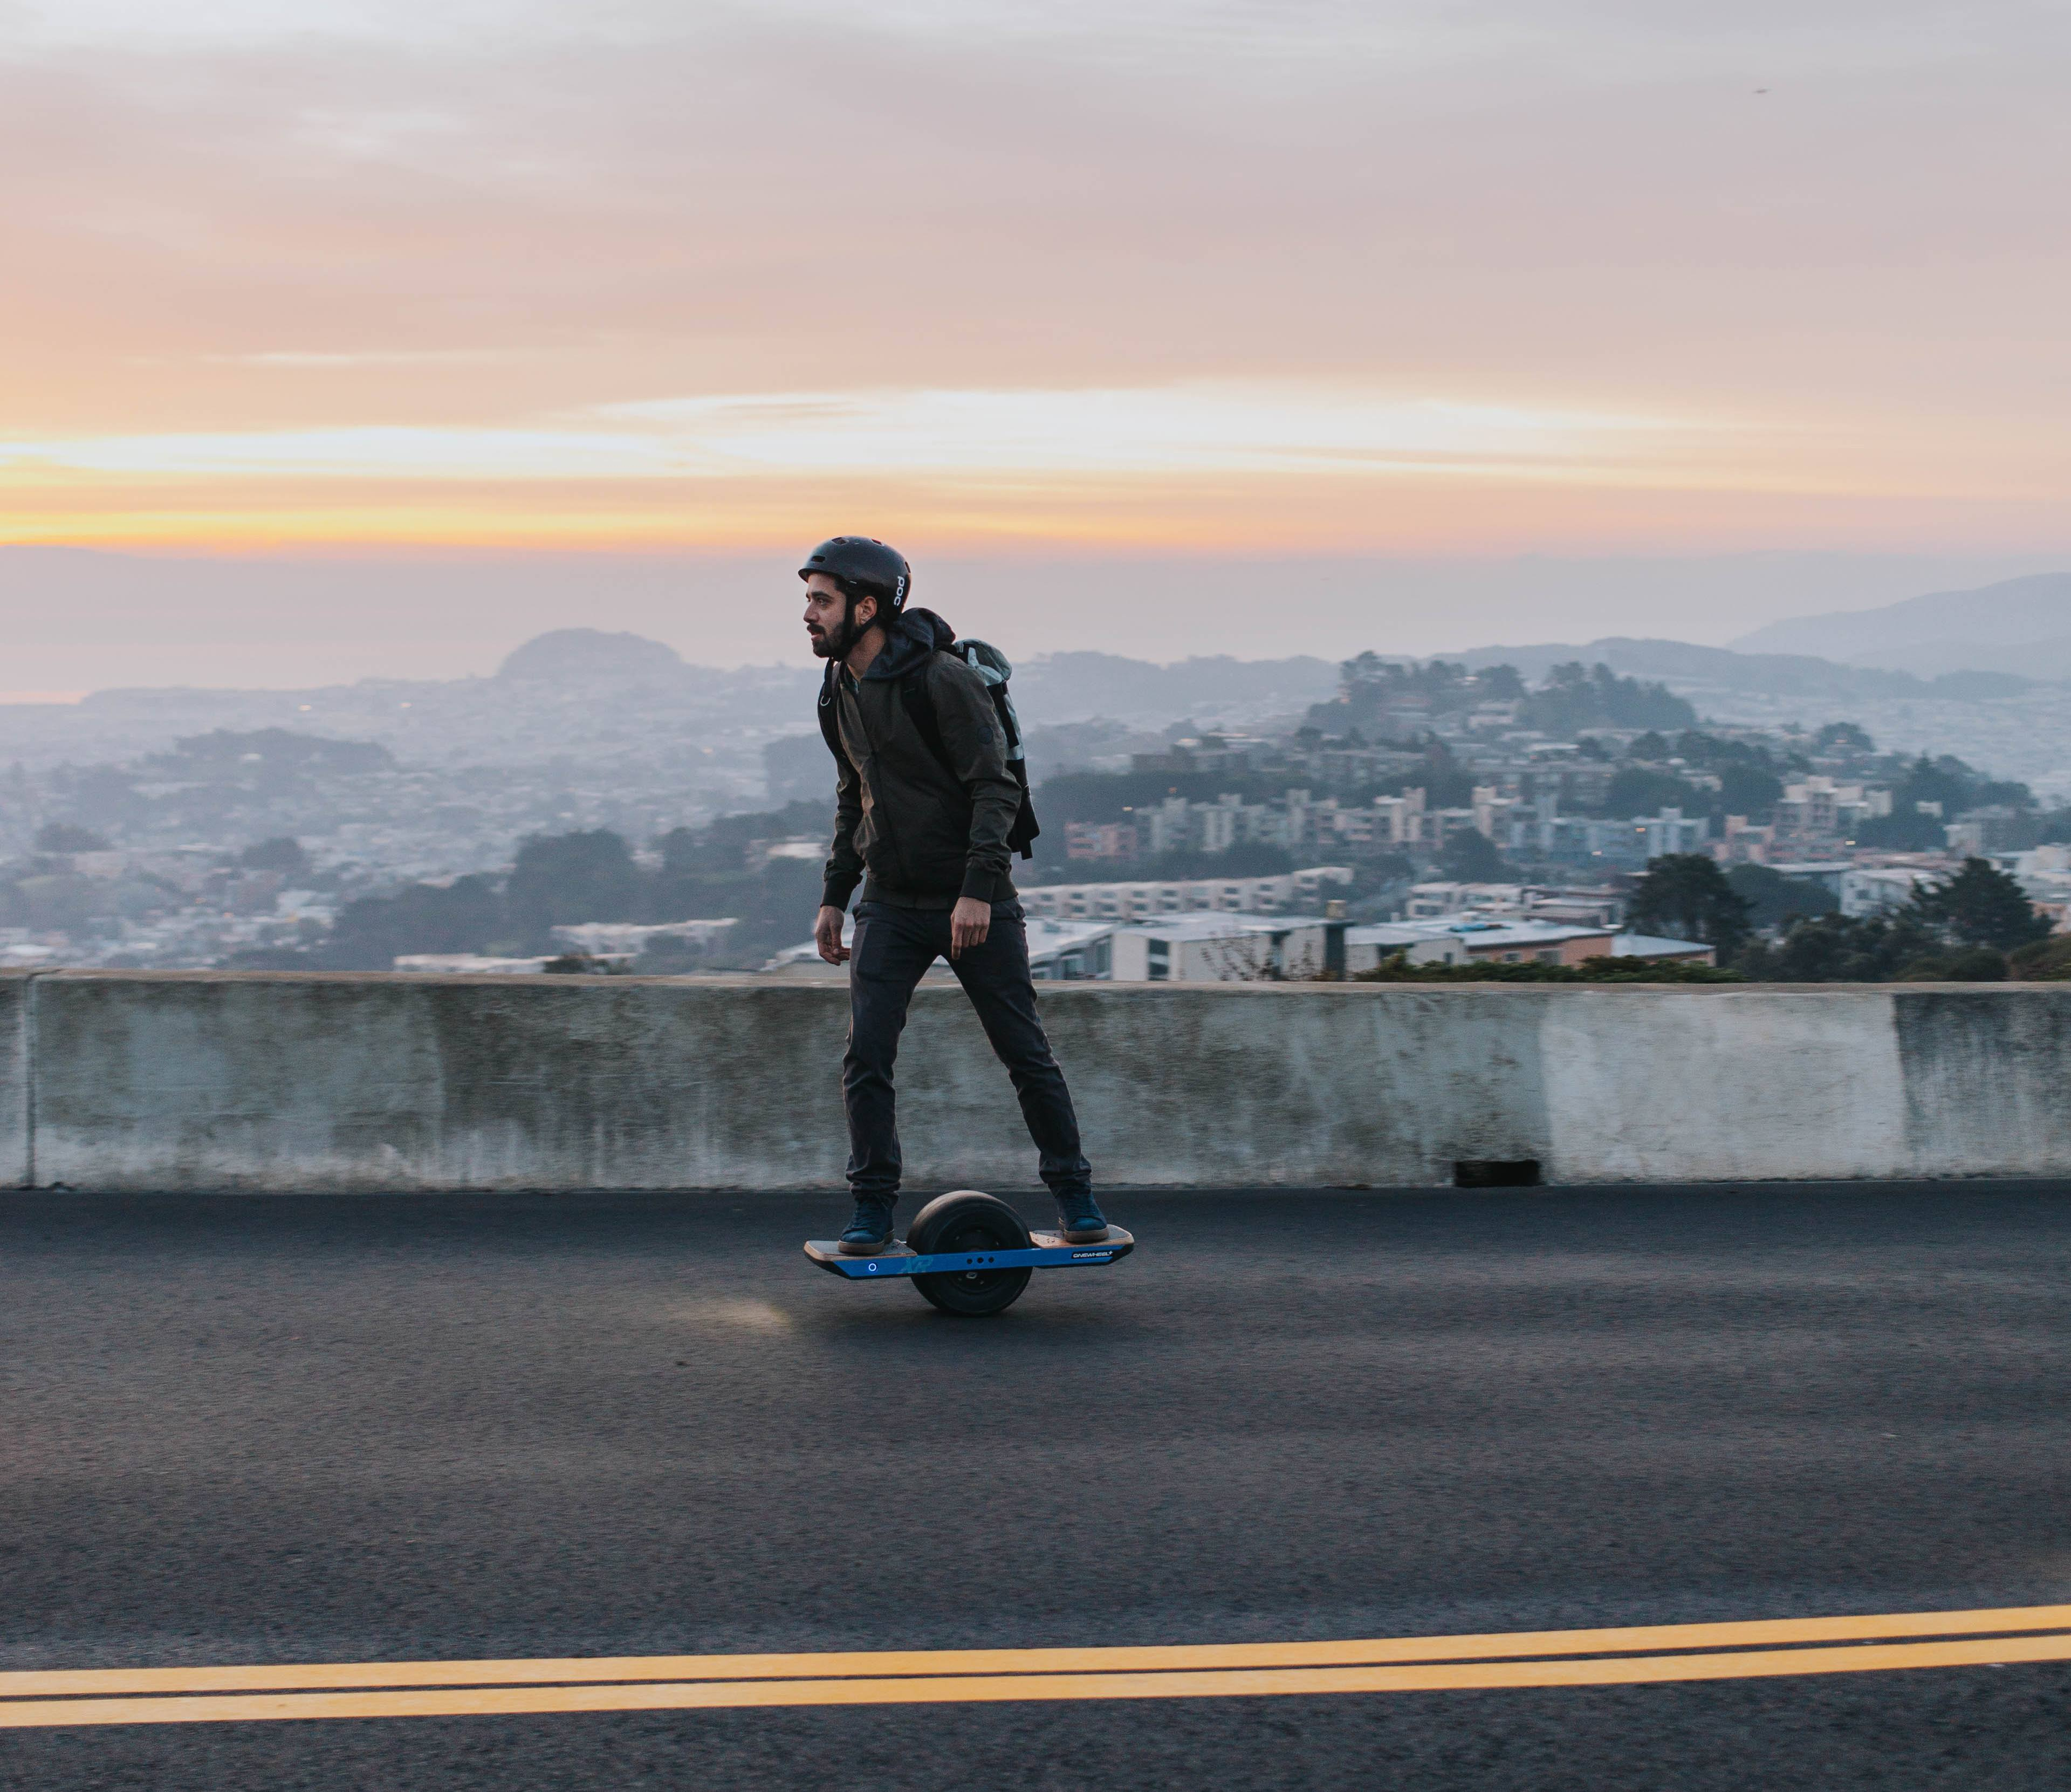 Man riding one wheel board on mountain